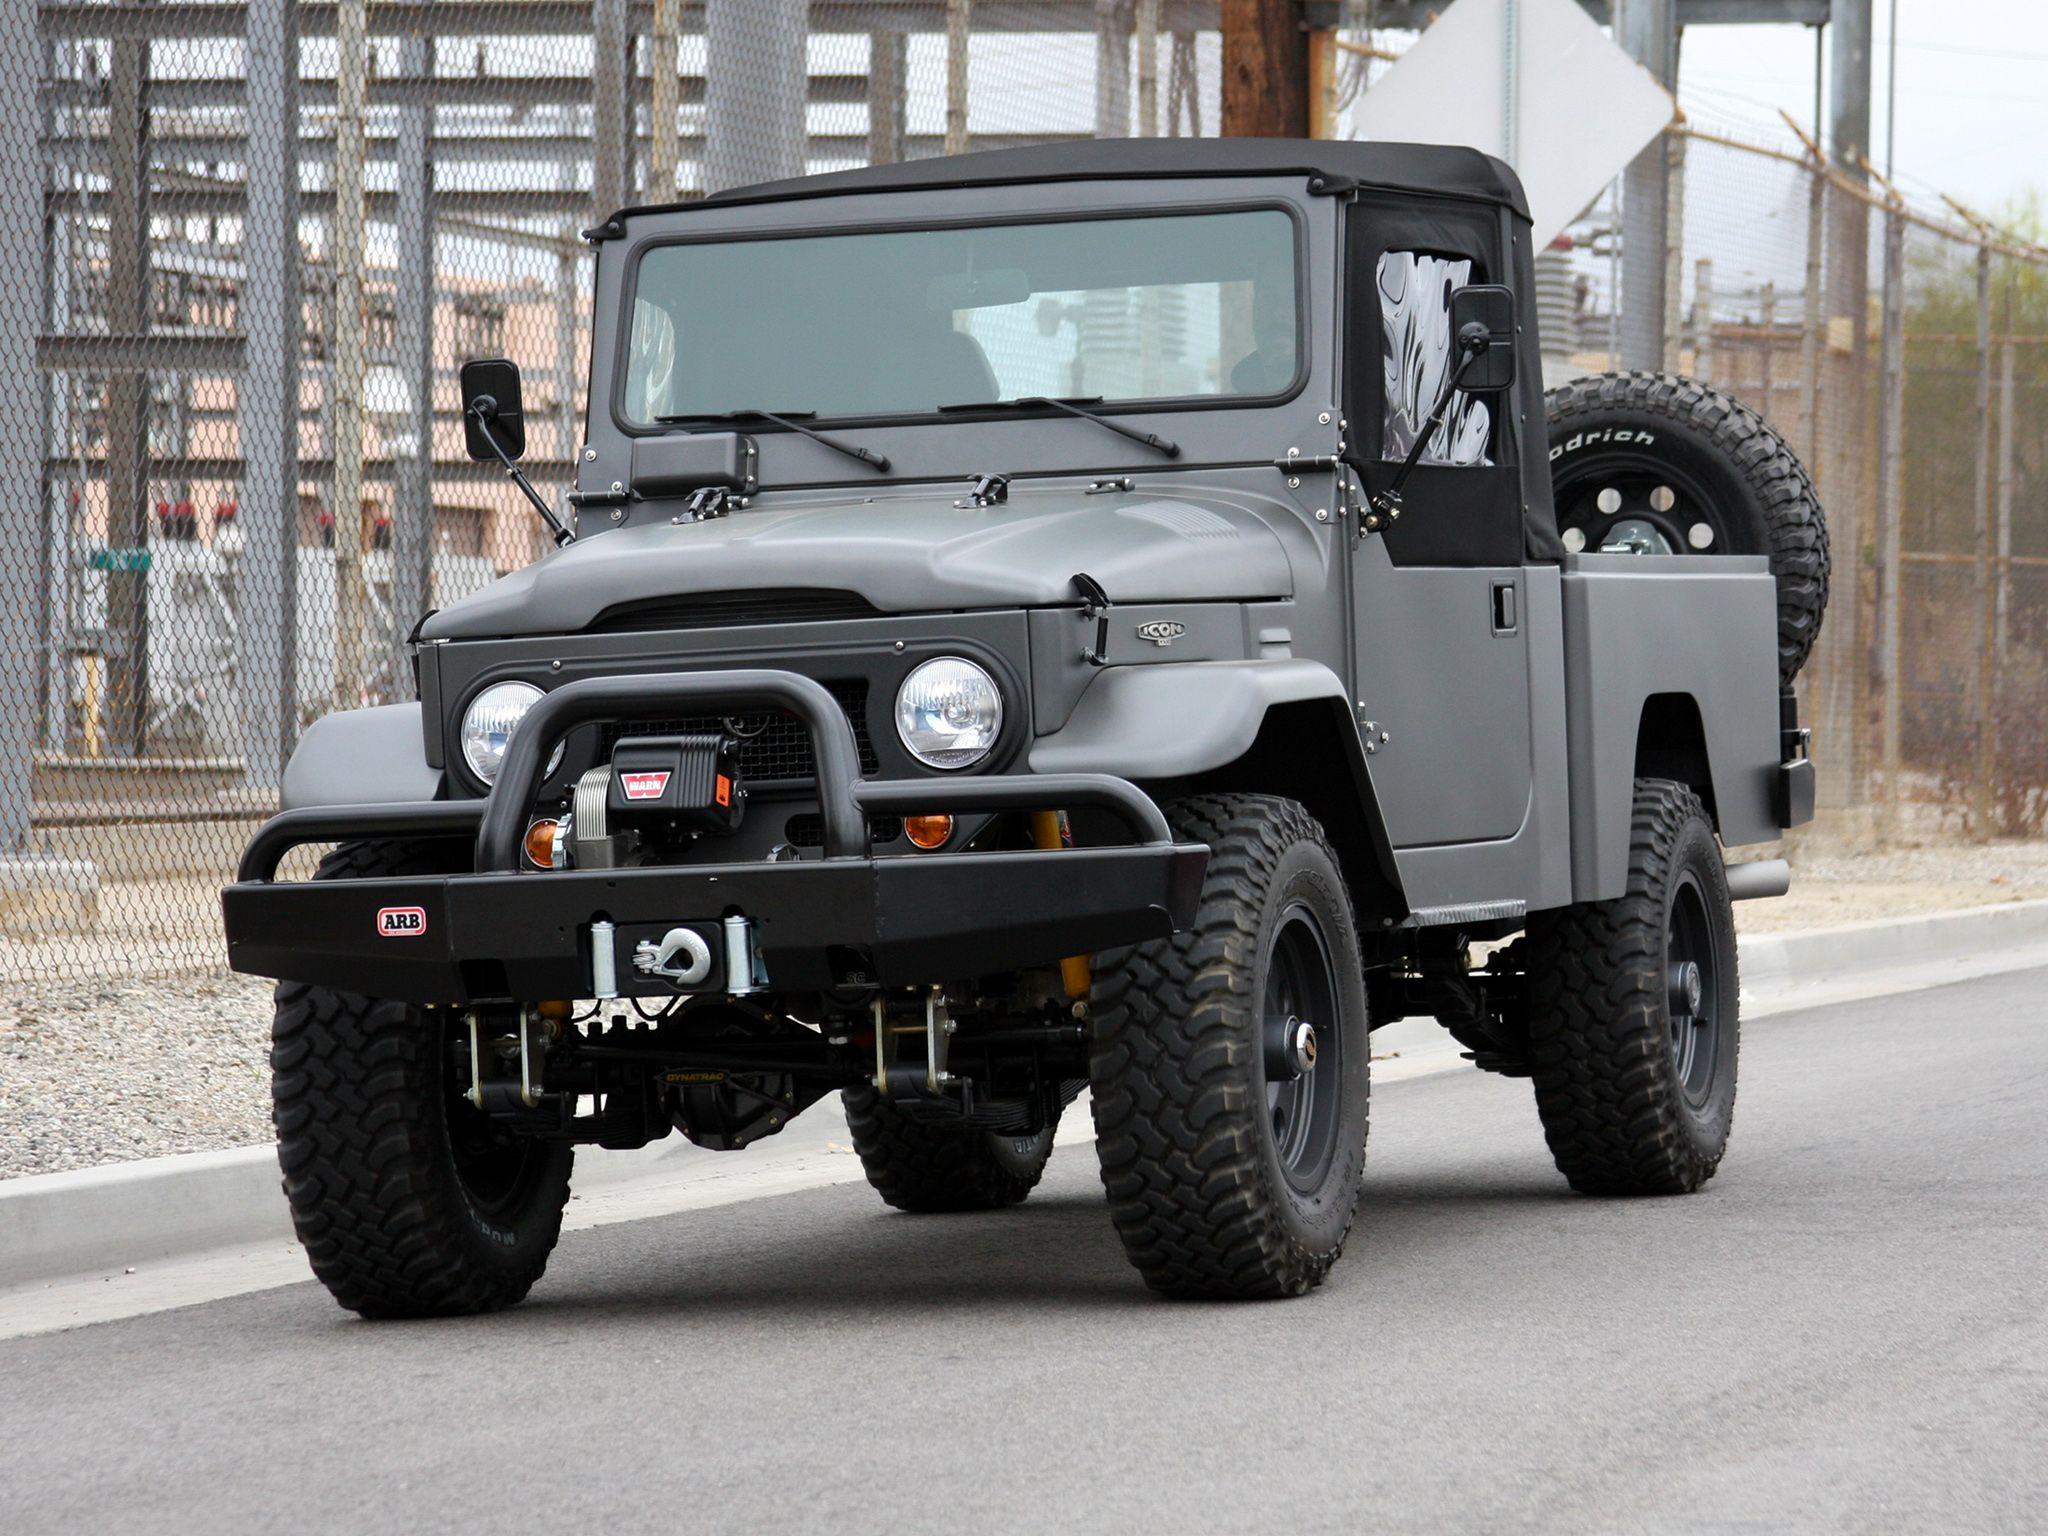 icon fj 45 the most expensive truck toyota land cruiser fj45 pinterest most most. Black Bedroom Furniture Sets. Home Design Ideas